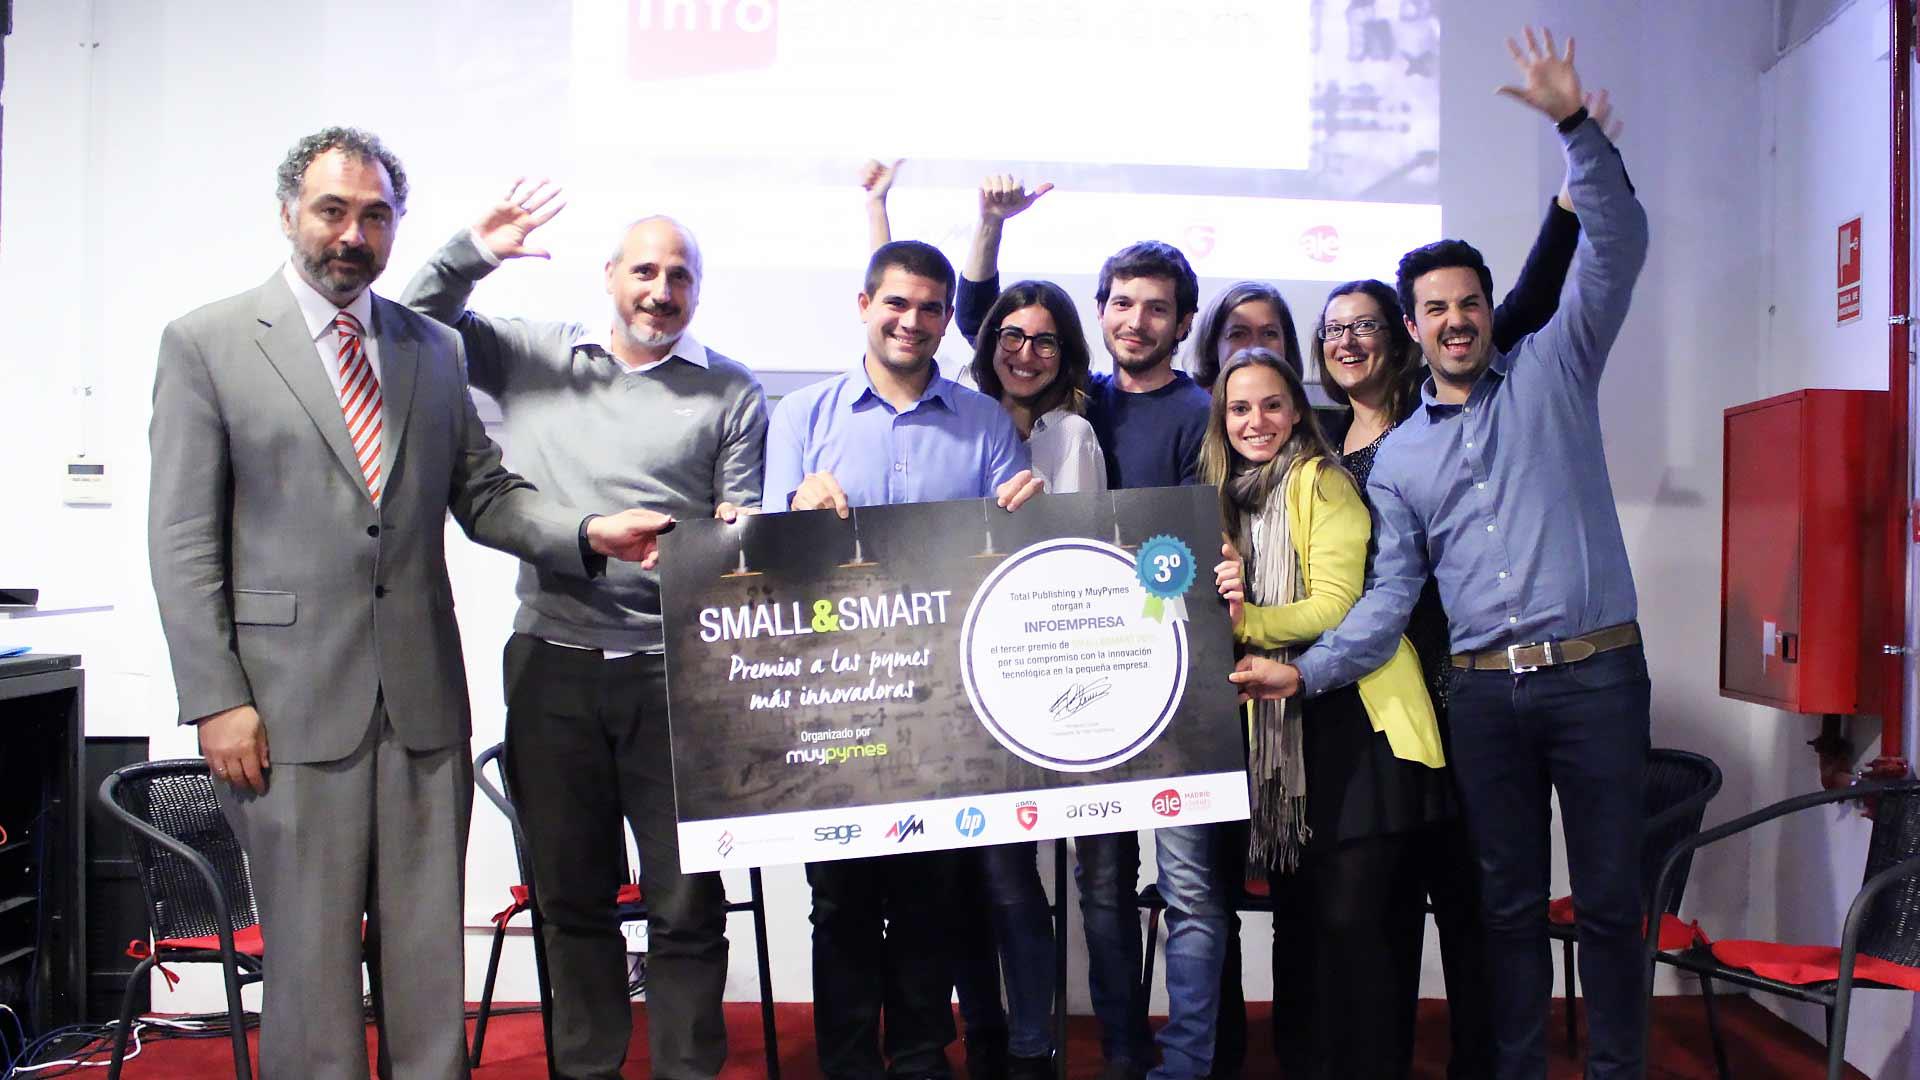 smallsmart-premios-startups-pymes-2015-ganador3-infoempresa